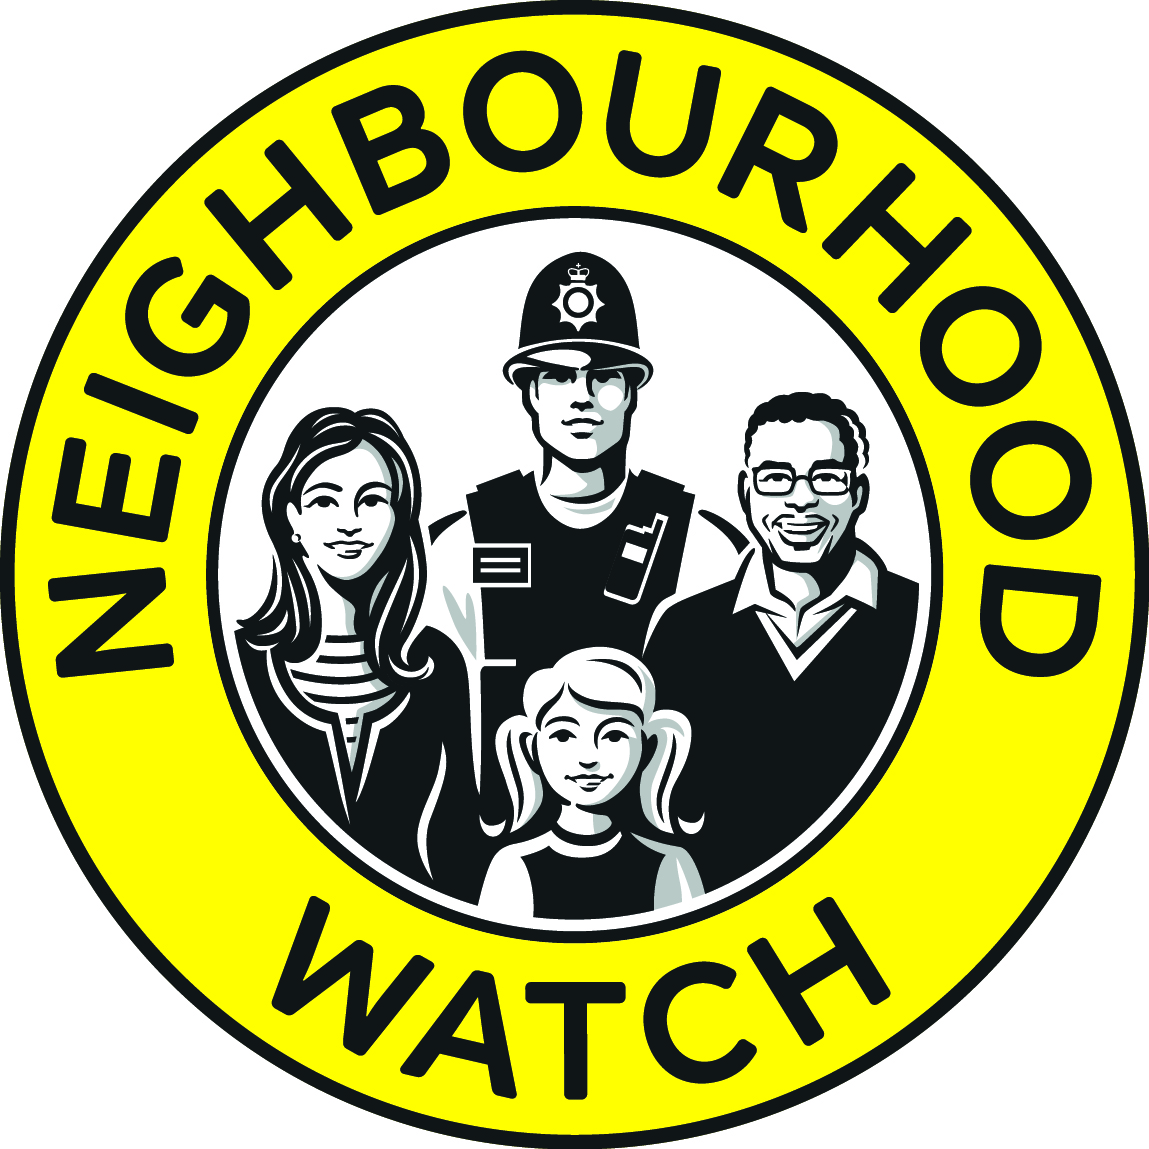 Link to Neighbourhood Watch website